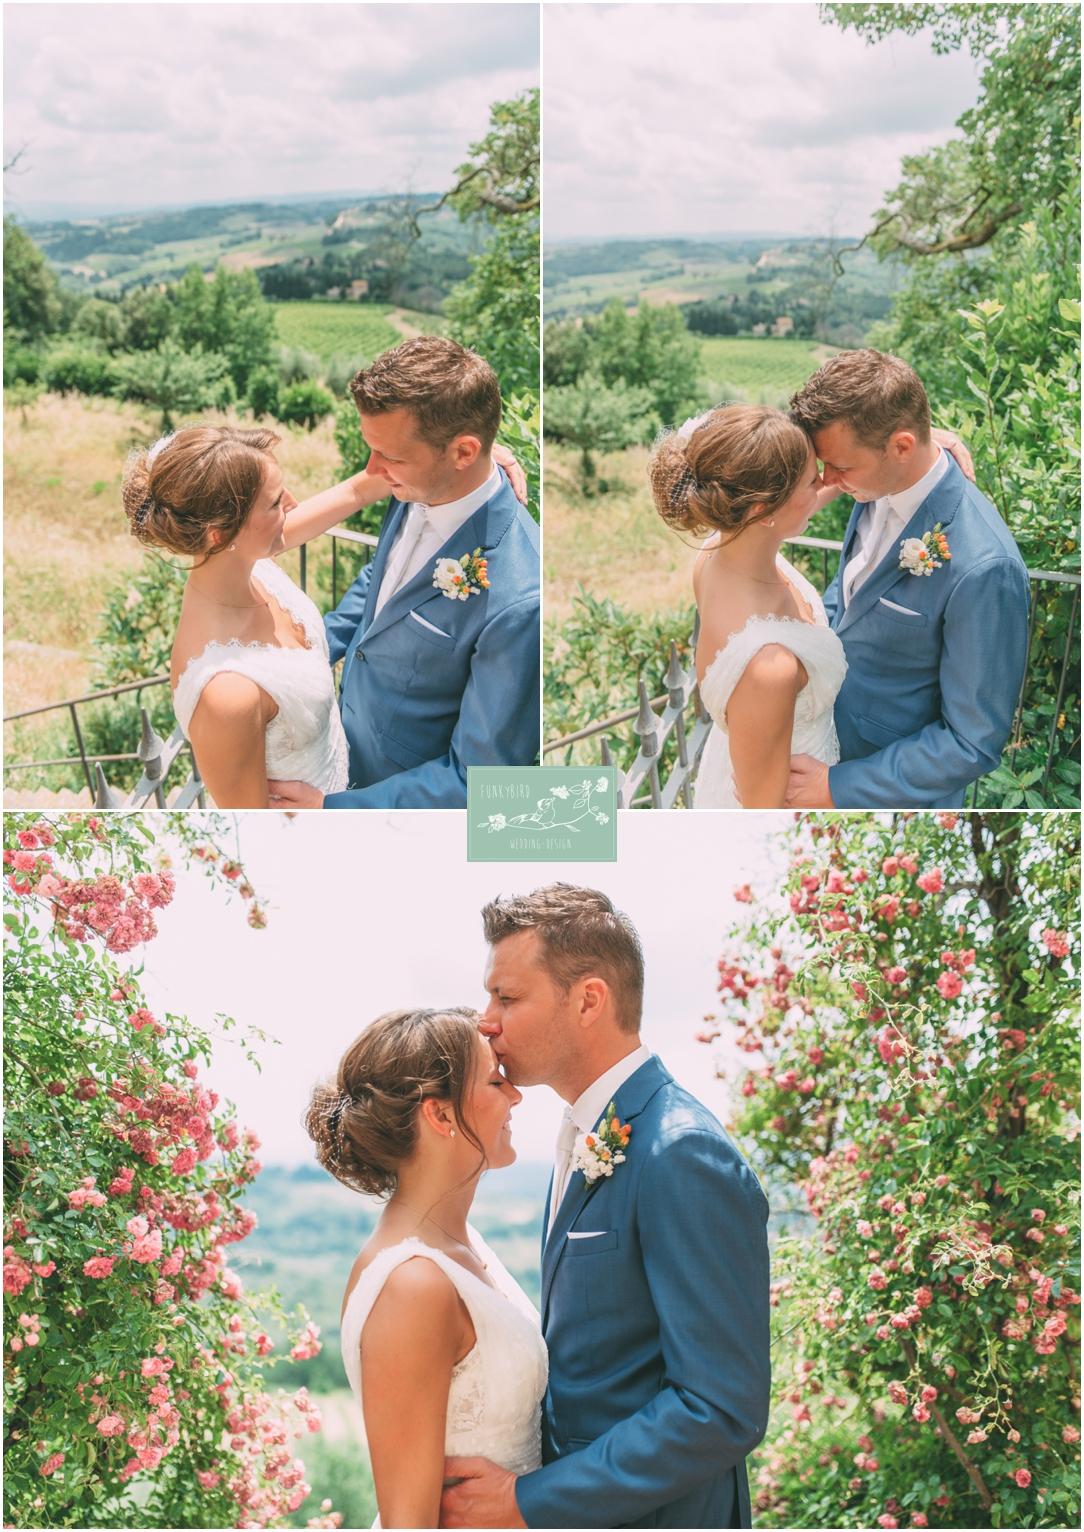 trouwen in toscane_flowers in Tuscany_tuscany wedding_0137.jpg